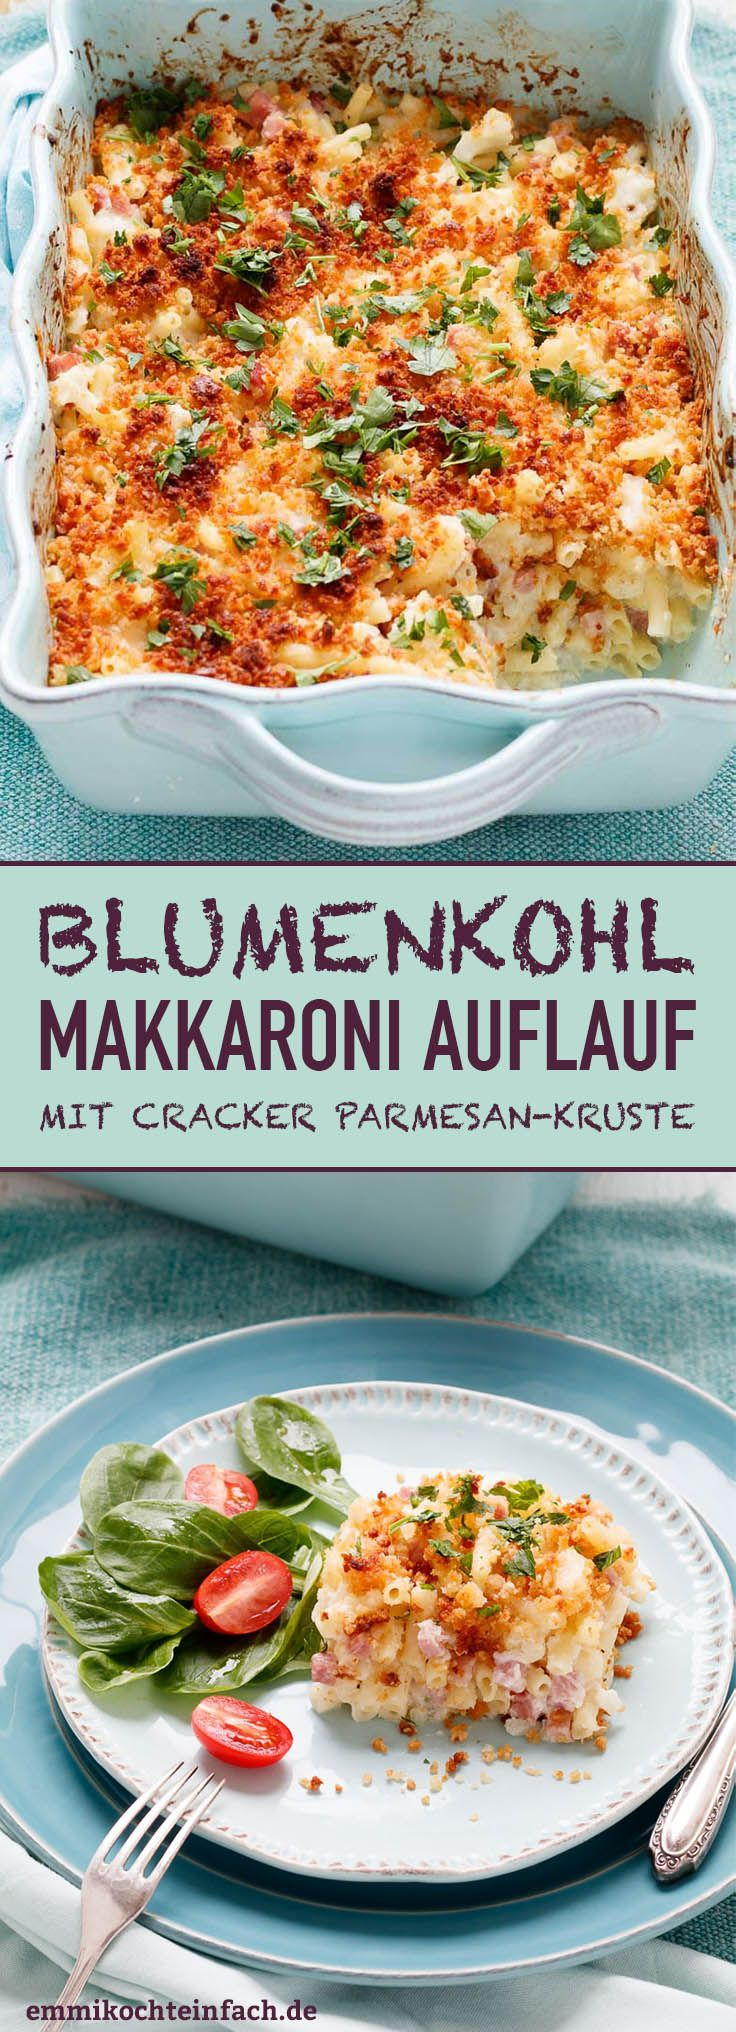 Blumenkohl Makkaroni Auflauf mit Kräcker-Parmesan-Kruste